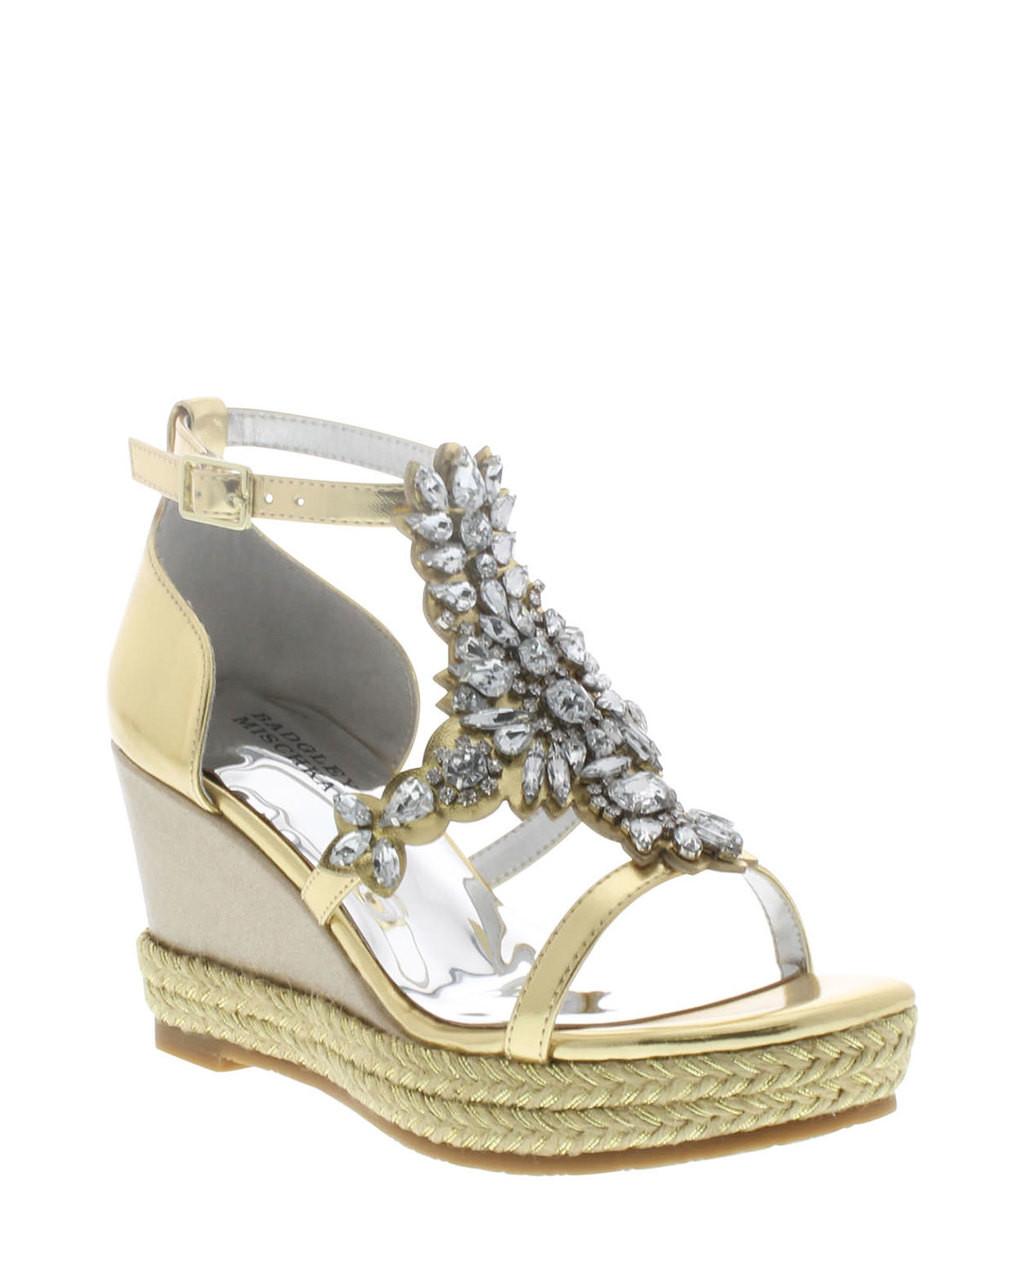 89ad152fb312 Sophia Cara Girls  Shoe by Badgley Mischka